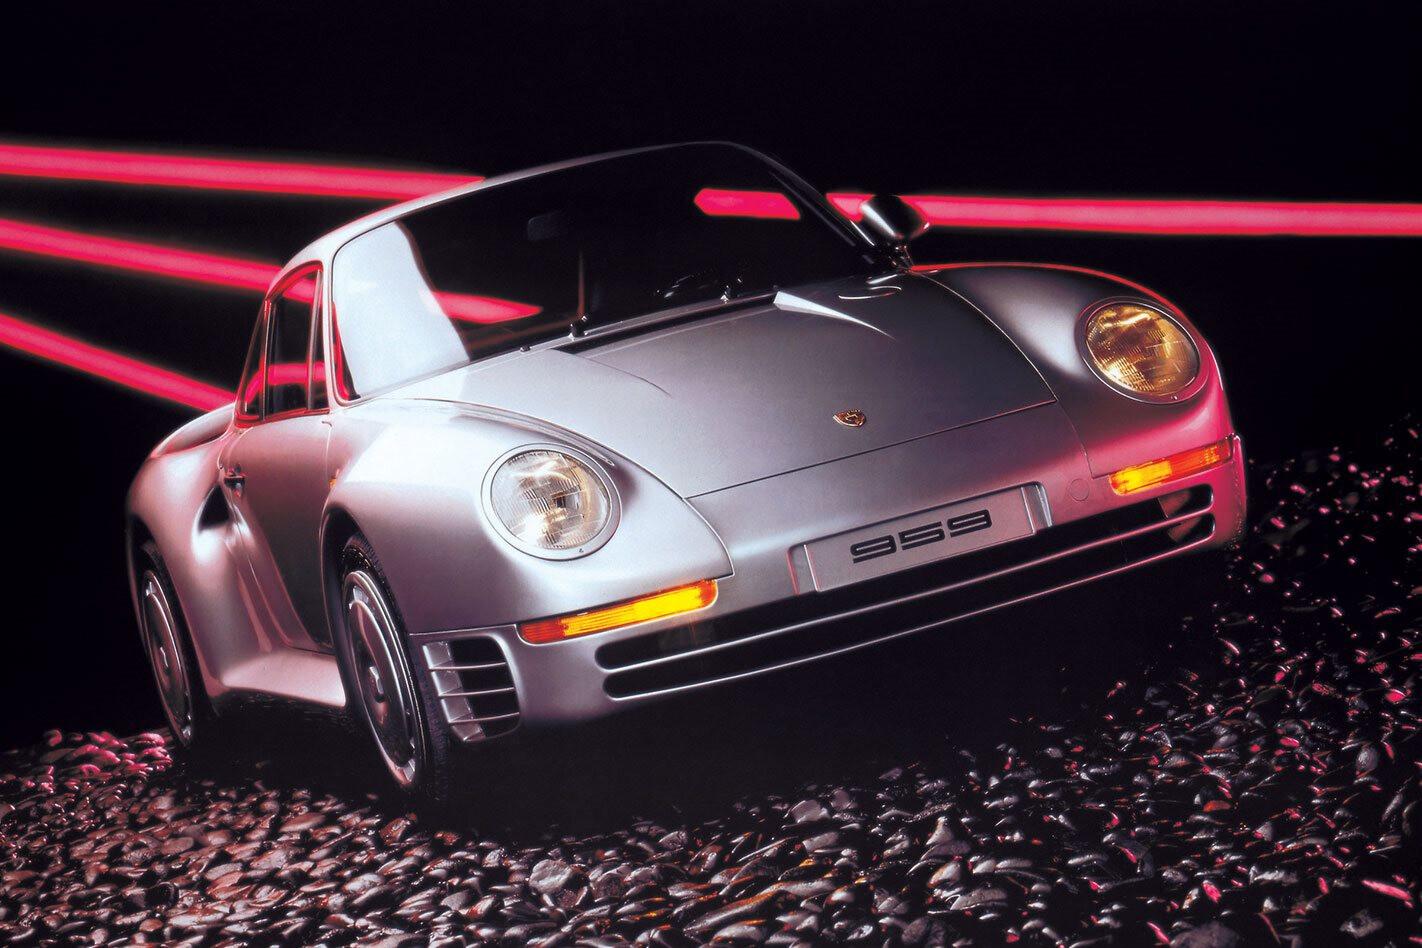 Porsche 959 neon